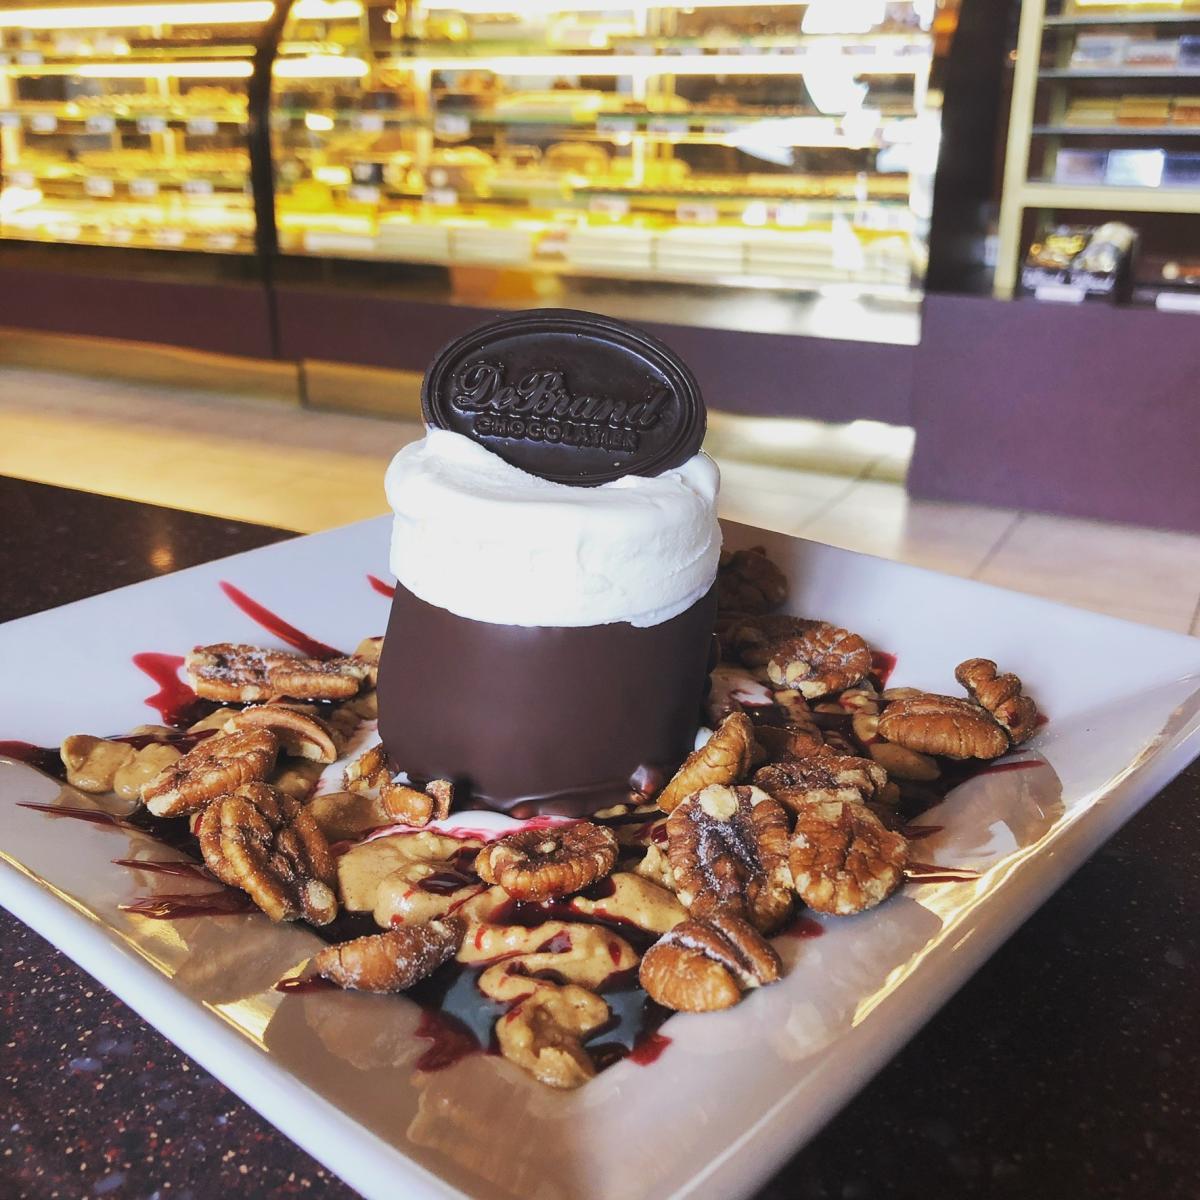 Ice cream sundae at DeBrand Fine Chocolate